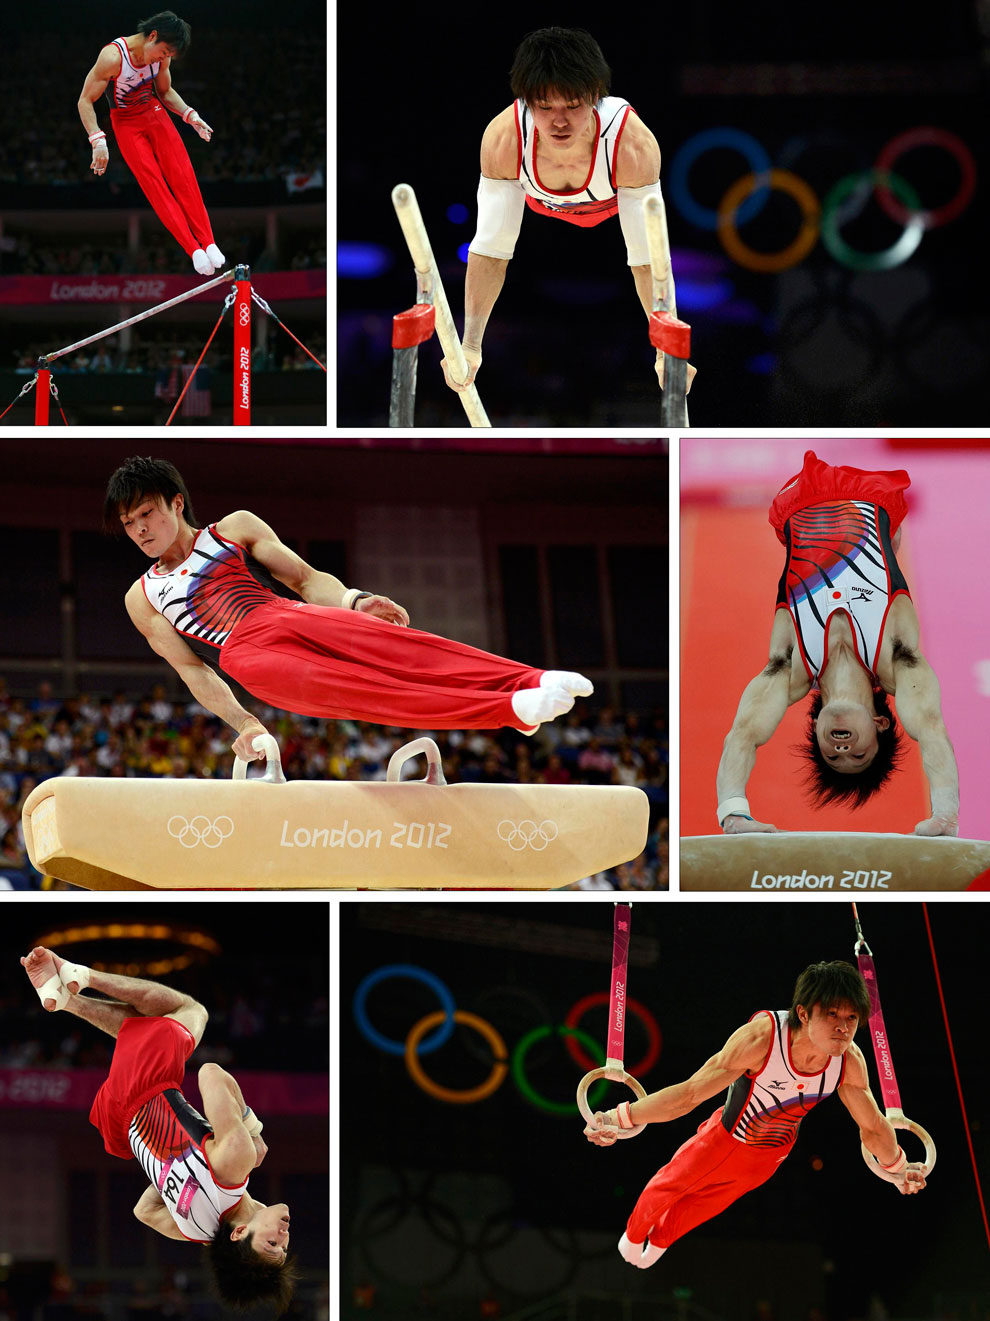 многоборец из Японии в гимнастике на олимпиаде в Англии